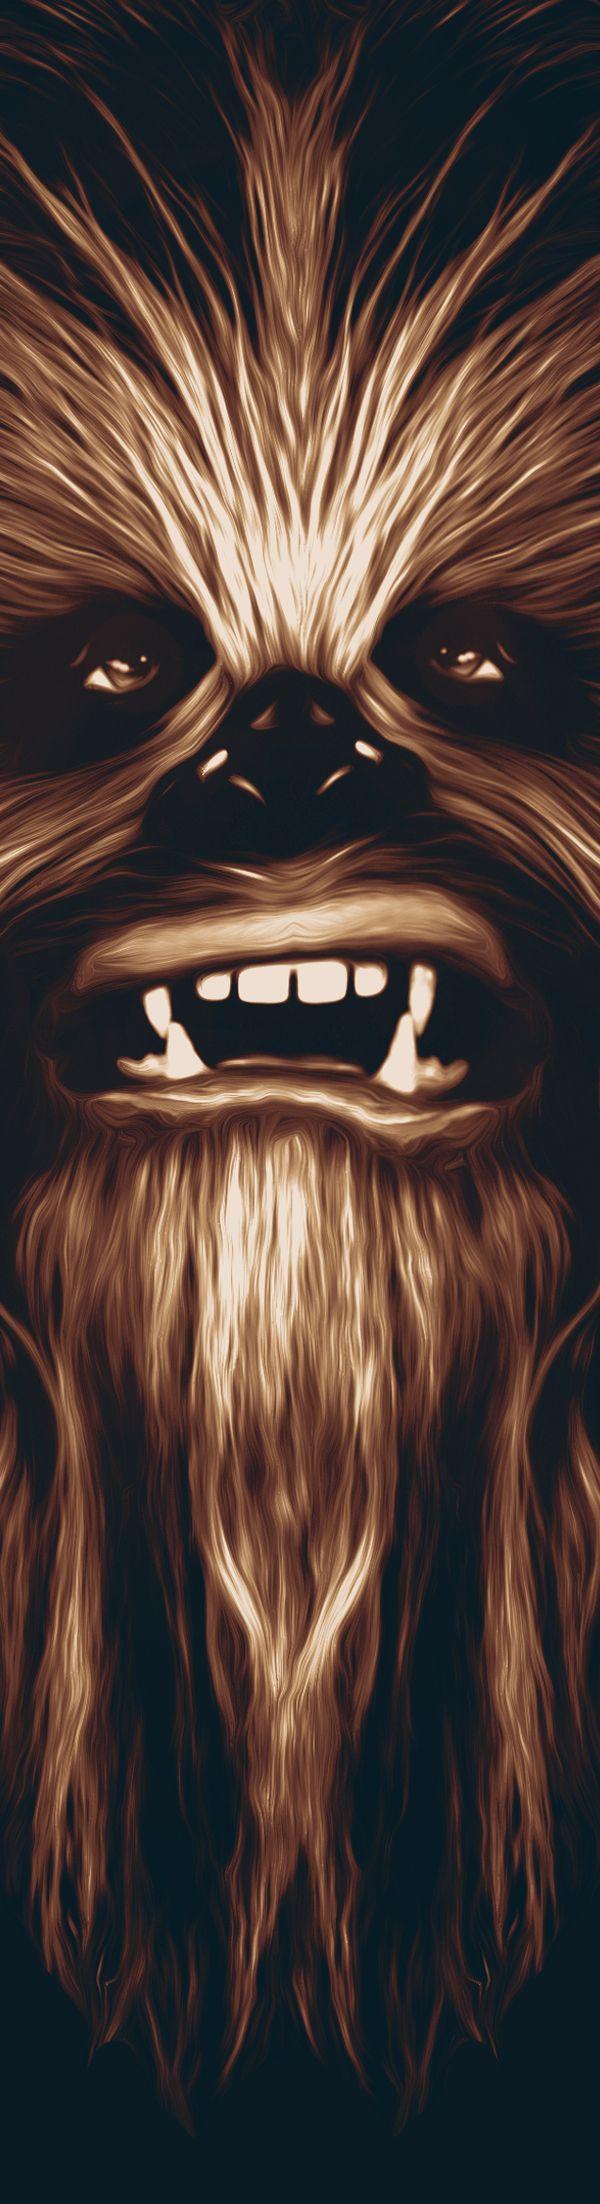 Chewbacca on Behance